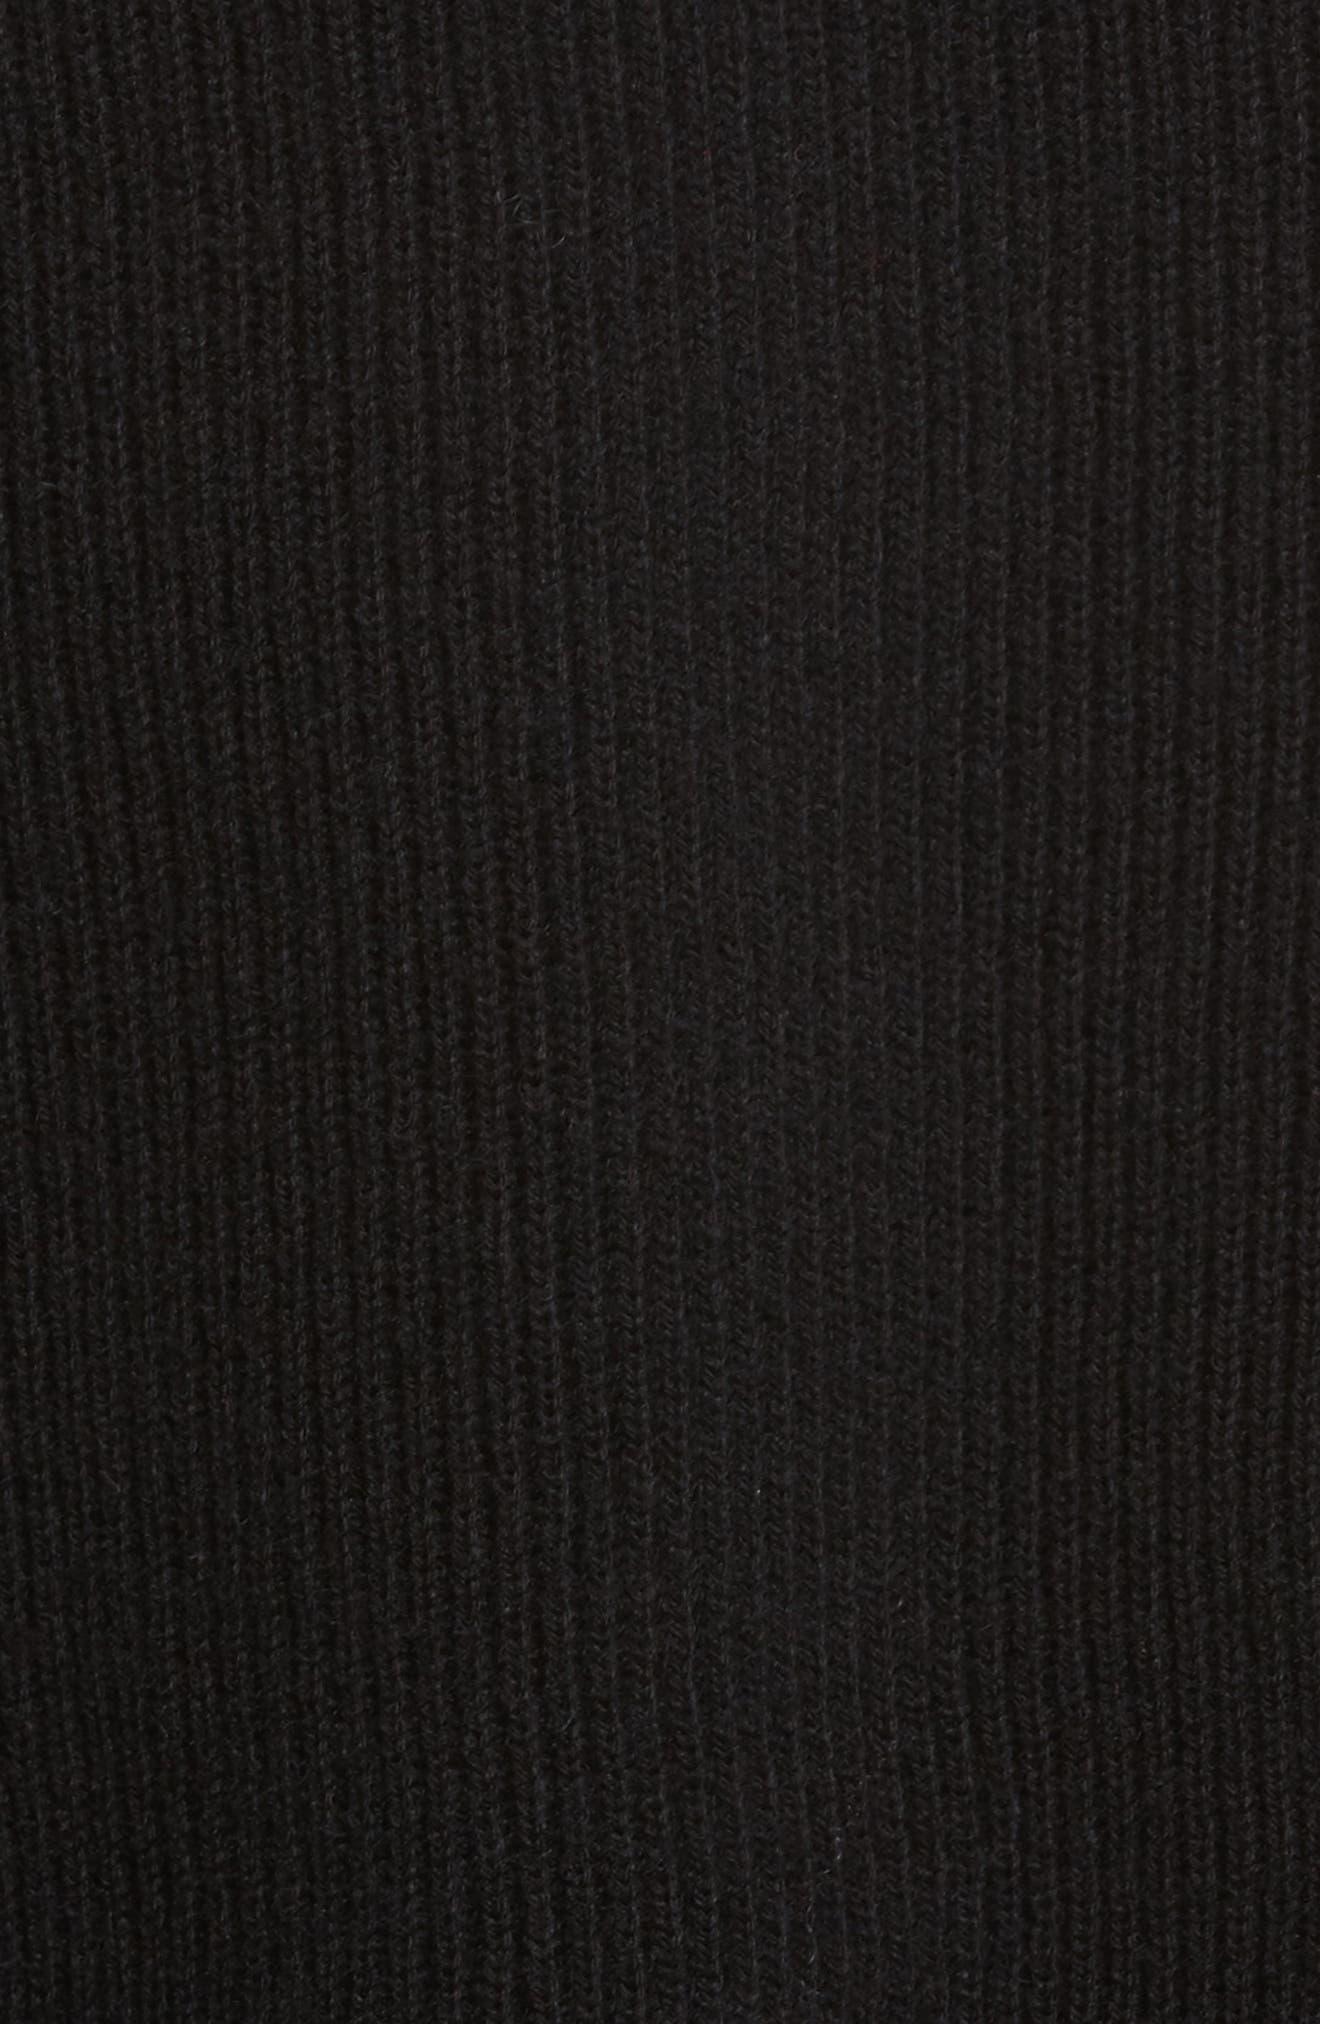 Distressed V-Neck Sweater,                             Alternate thumbnail 5, color,                             001